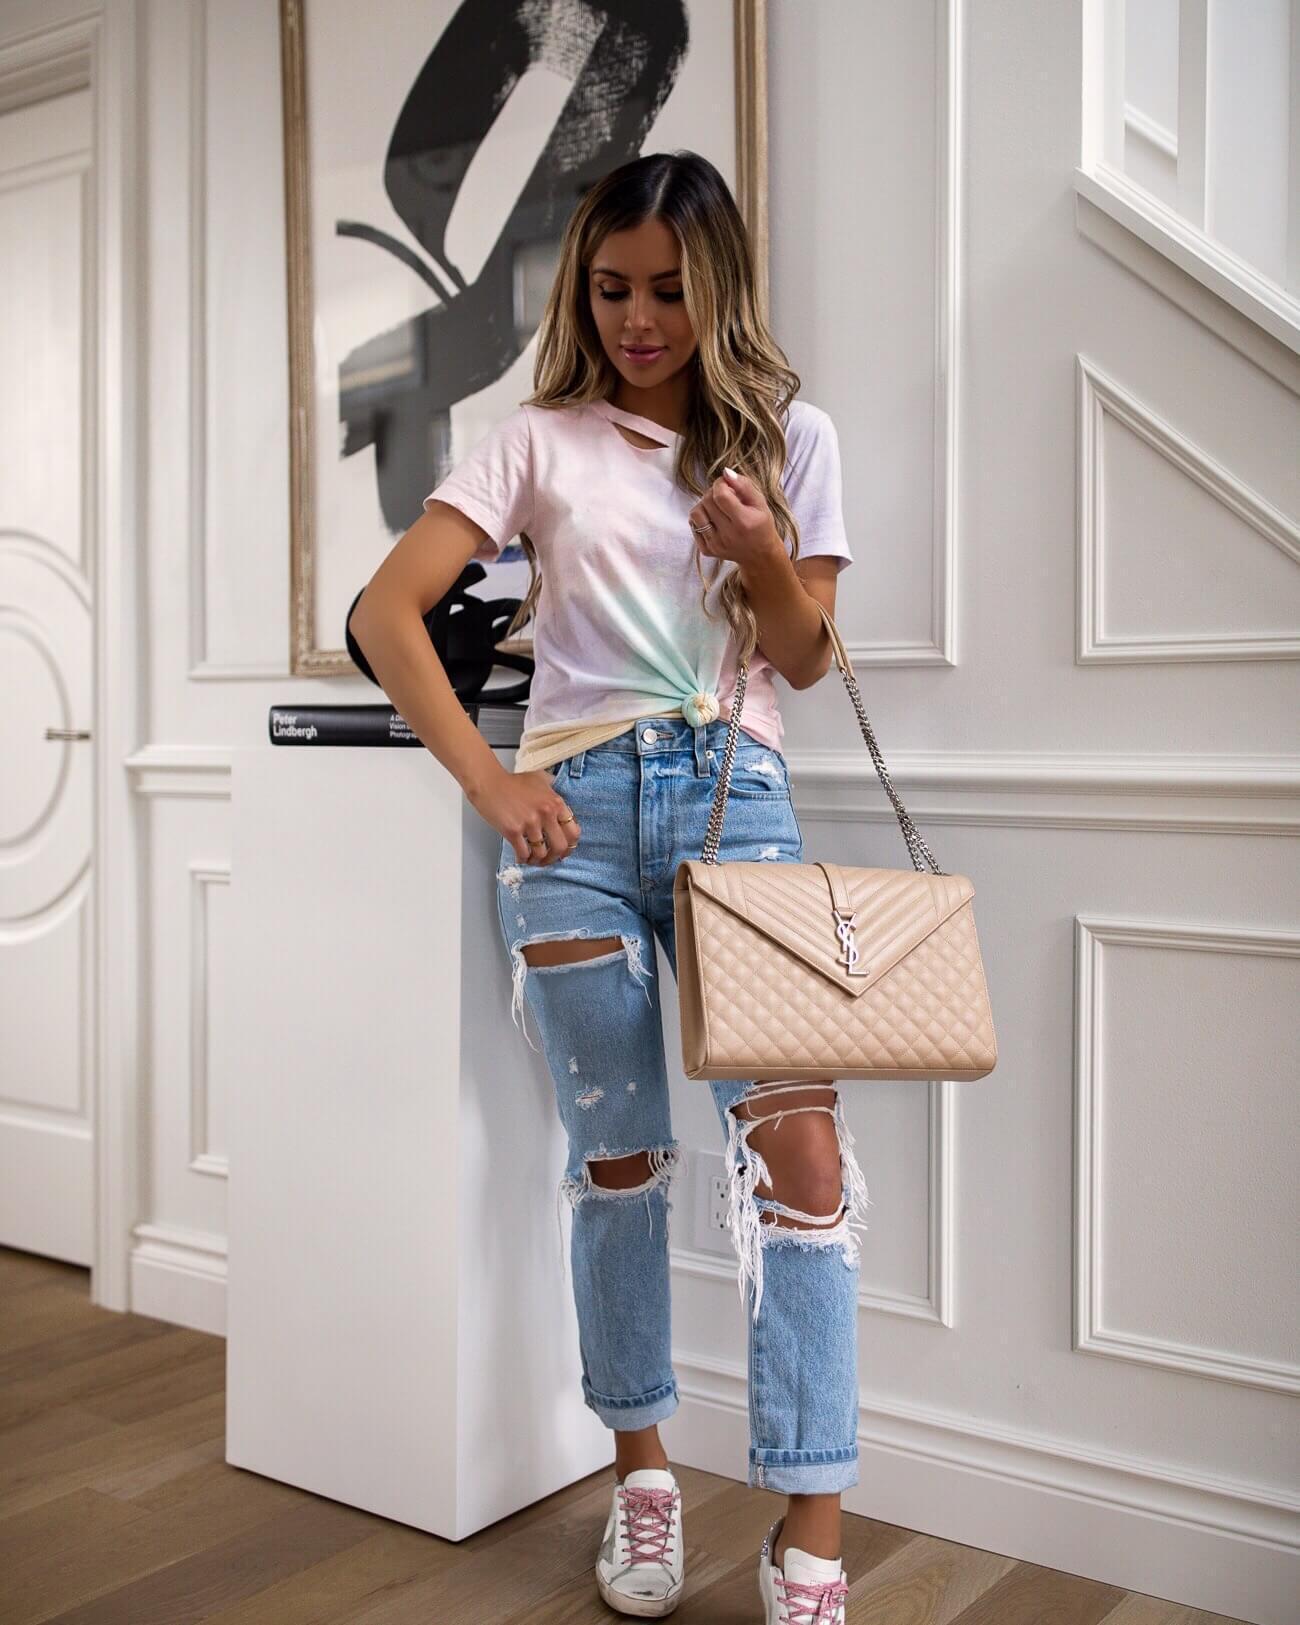 maria vizuete mia mia mine blogger t-shirt bag shoes